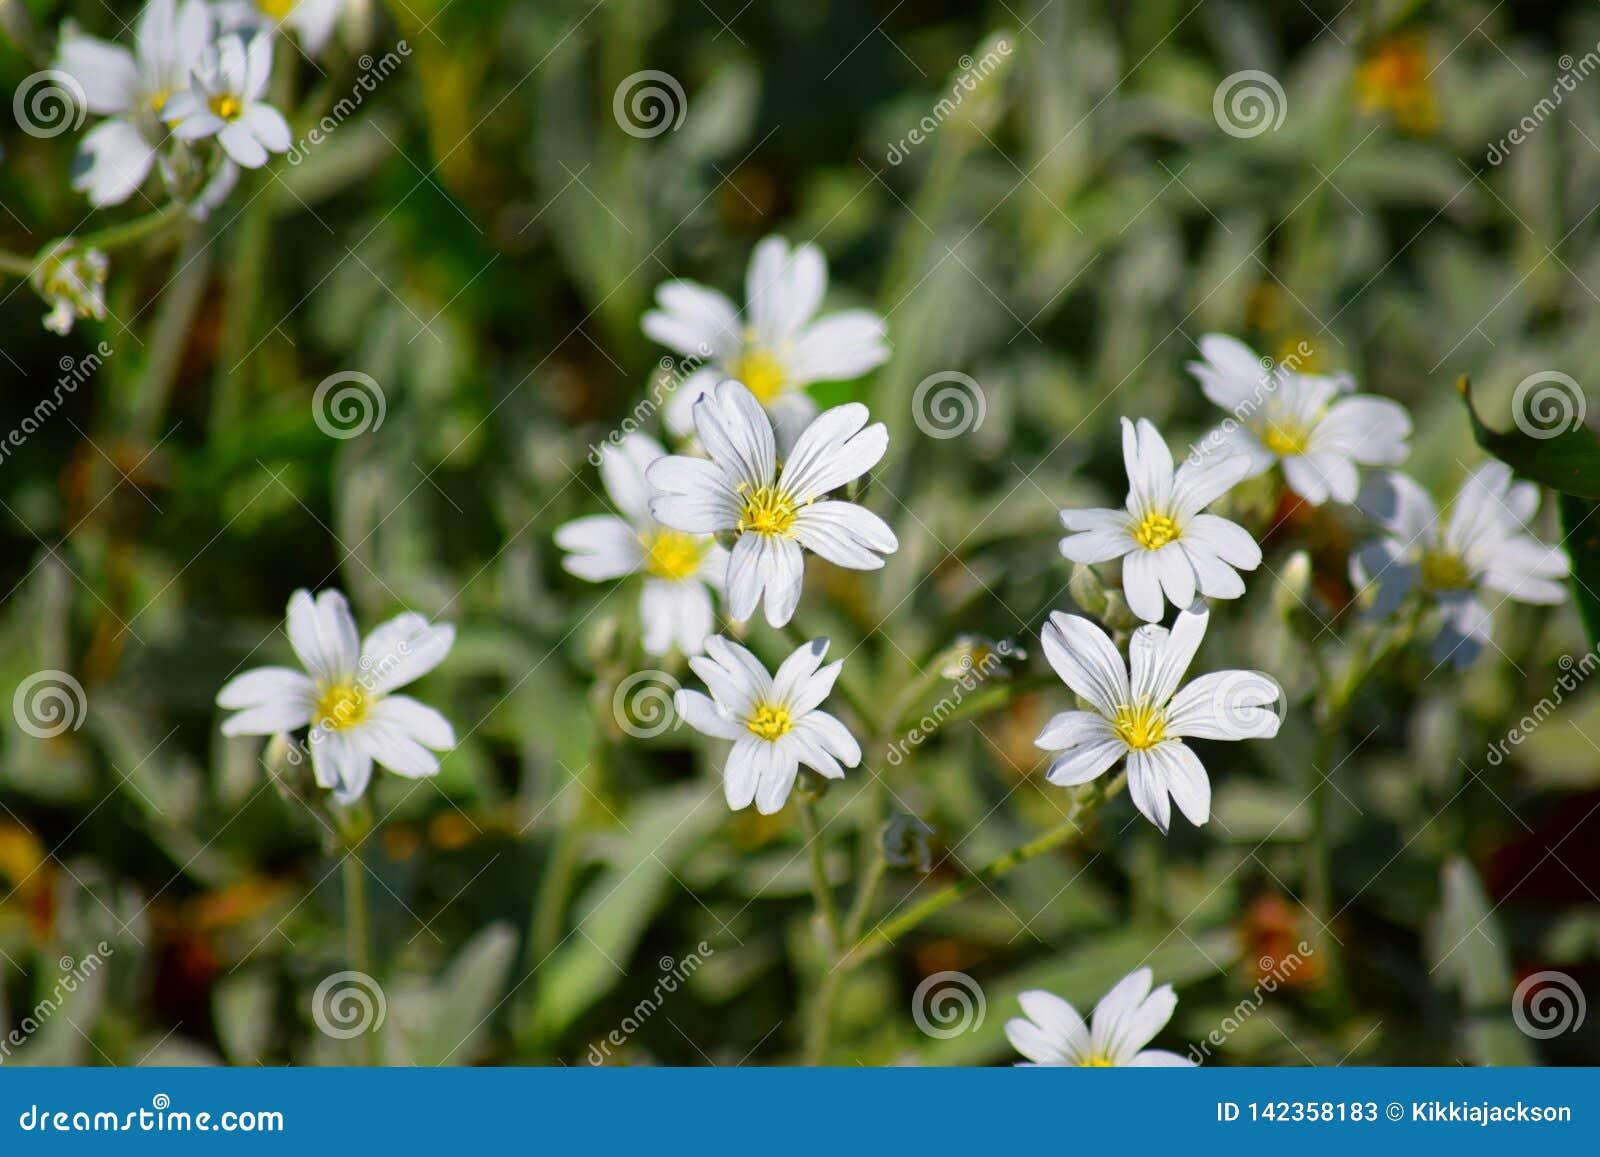 White Small Tiny Flowers Home Garden Plants Bacjground Stock Photo